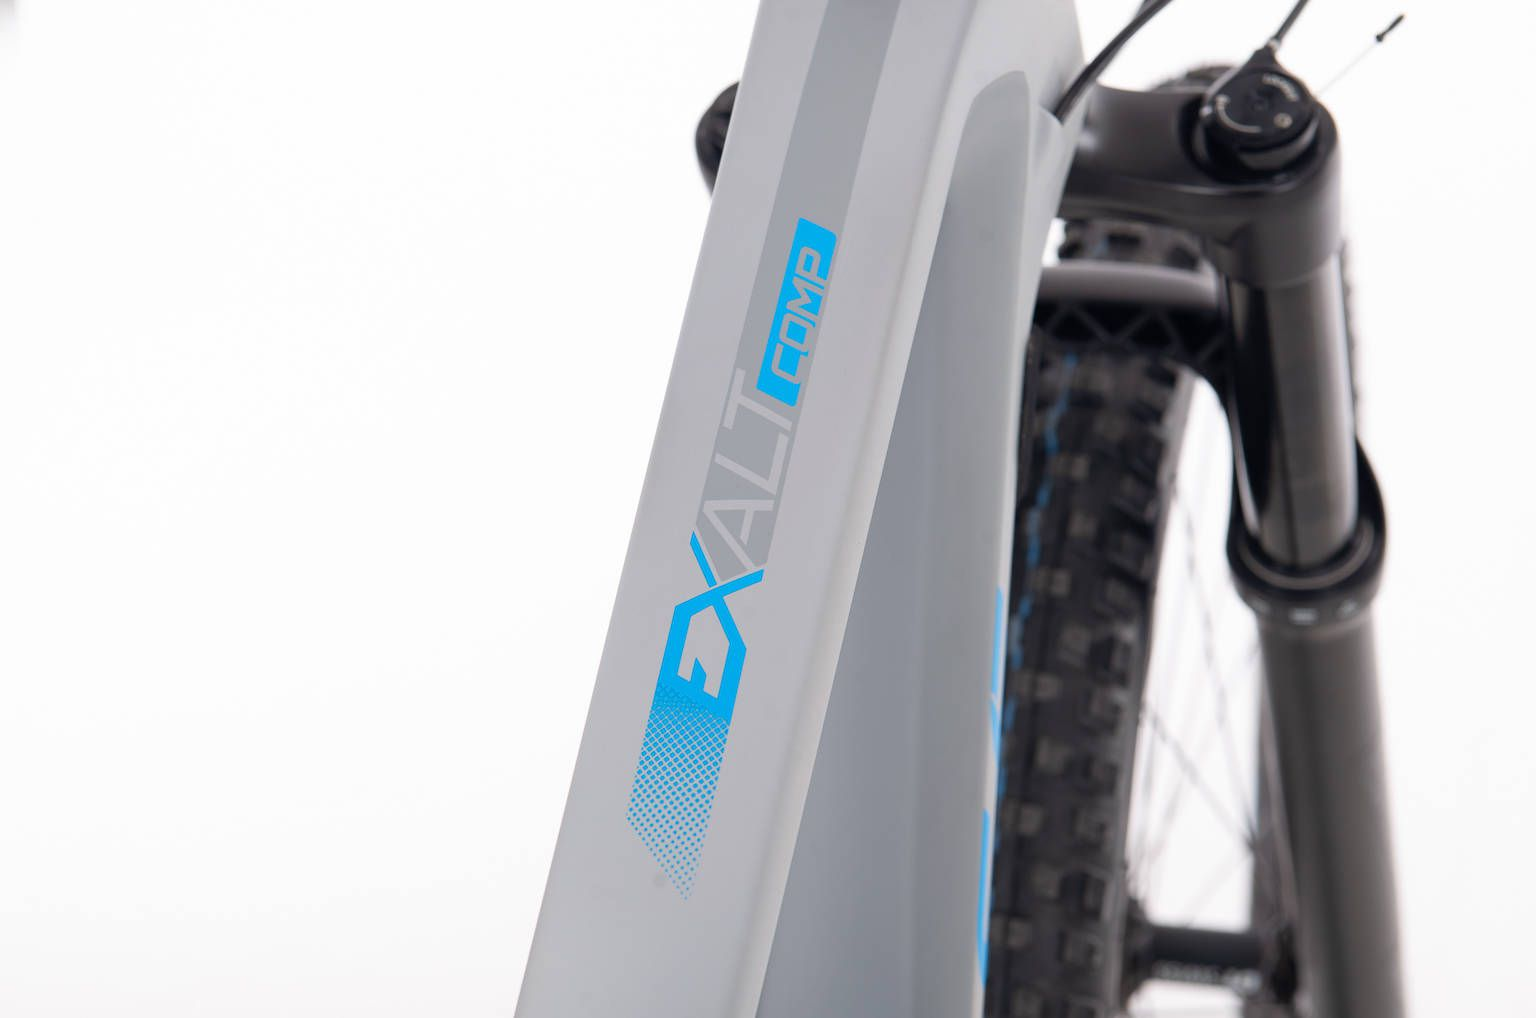 Bicicleta SENSE Exalt Comp 2020 - 12v Sram NX Eagle - Azul/Cinza